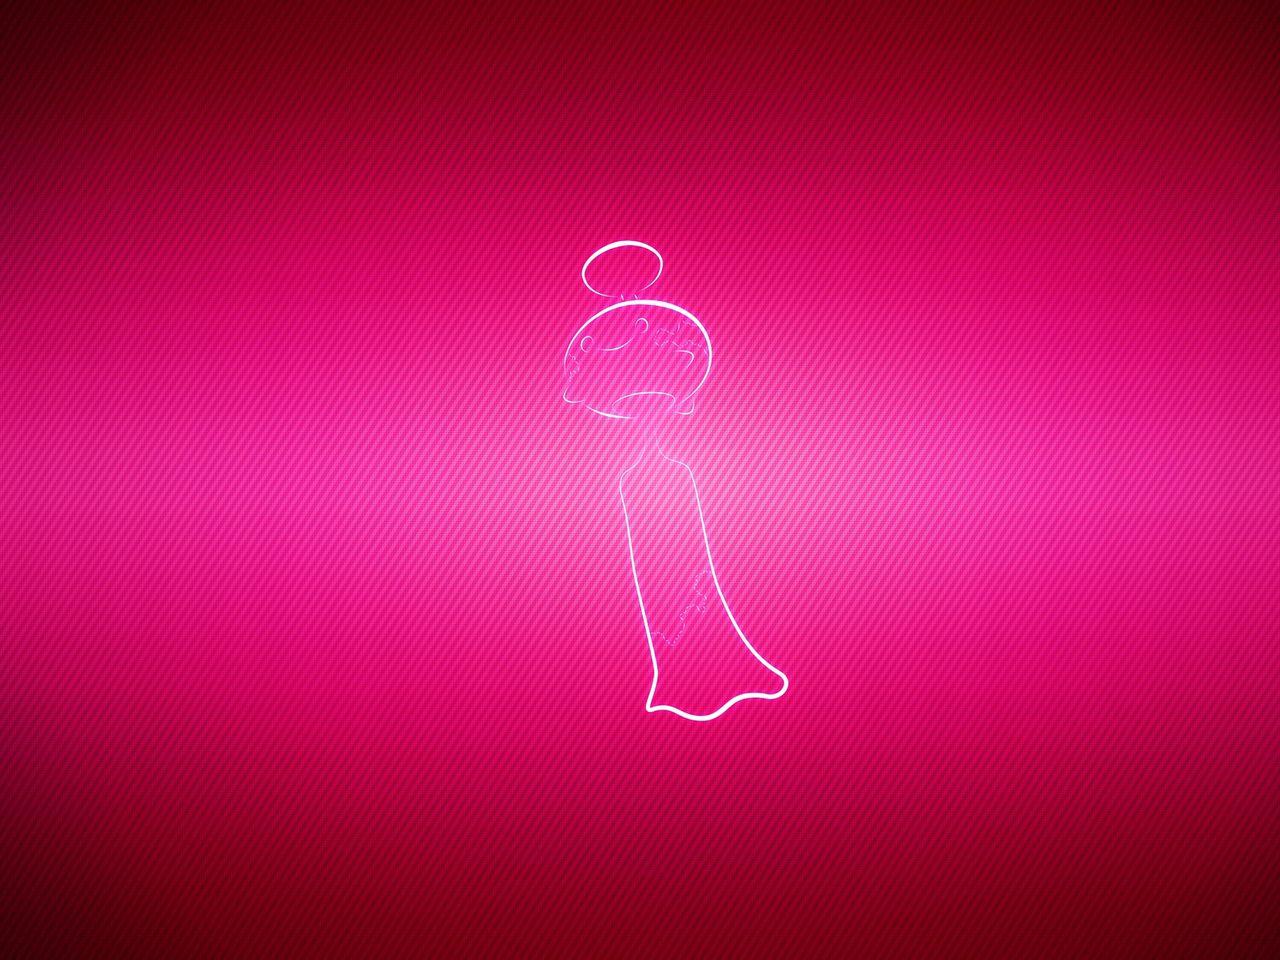 Download wallpaper 1280x960 pokemon pink chimecho standard 43 1280x960